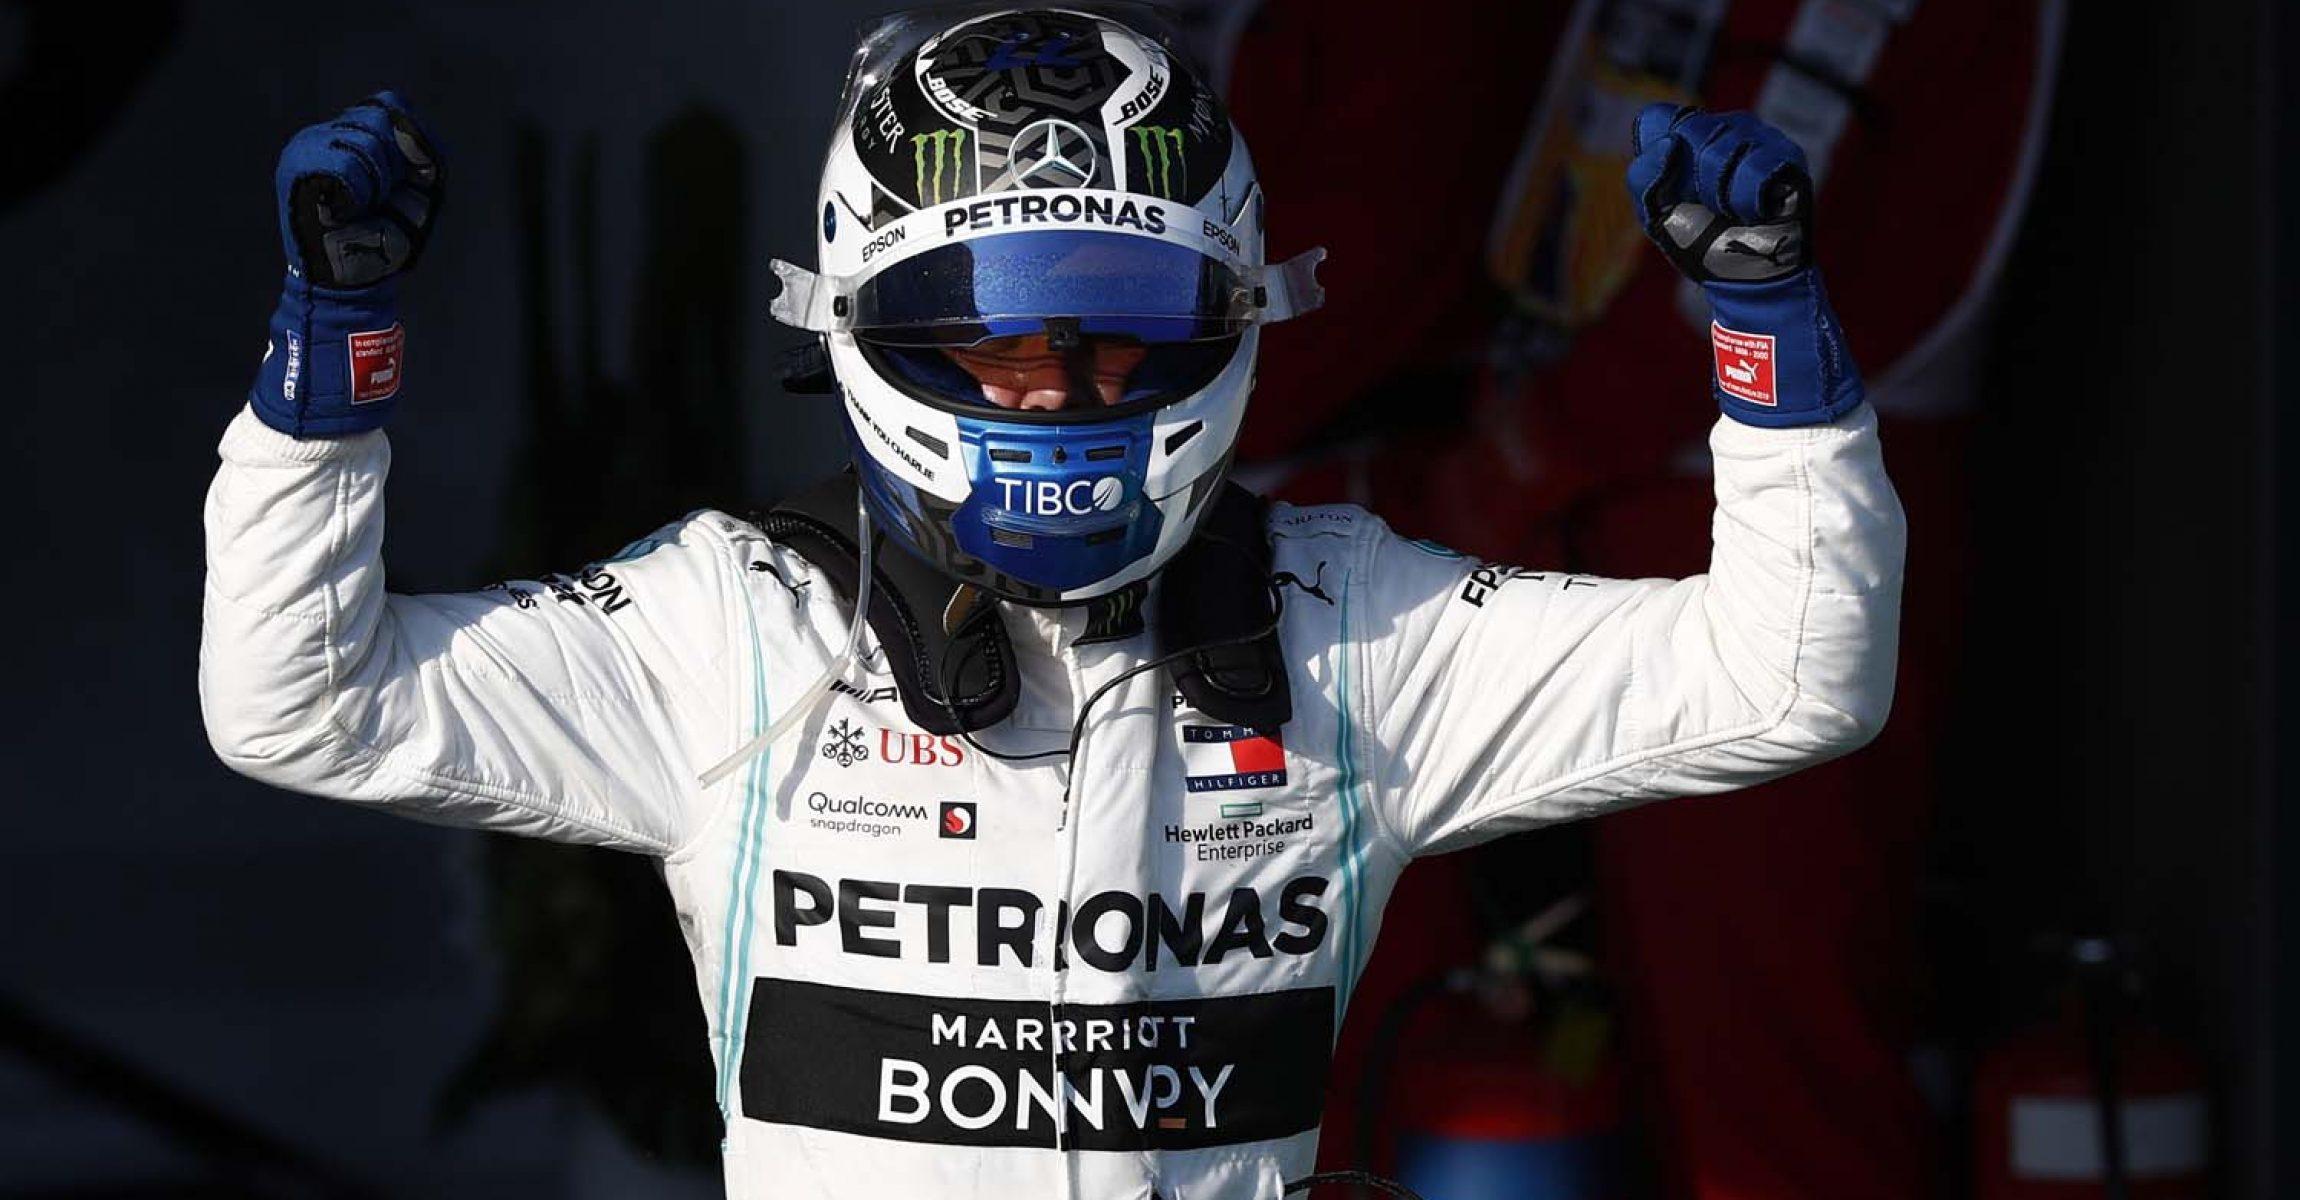 2019 Australian Grand Prix, Sunday - LAT Images Valtteri Bottas